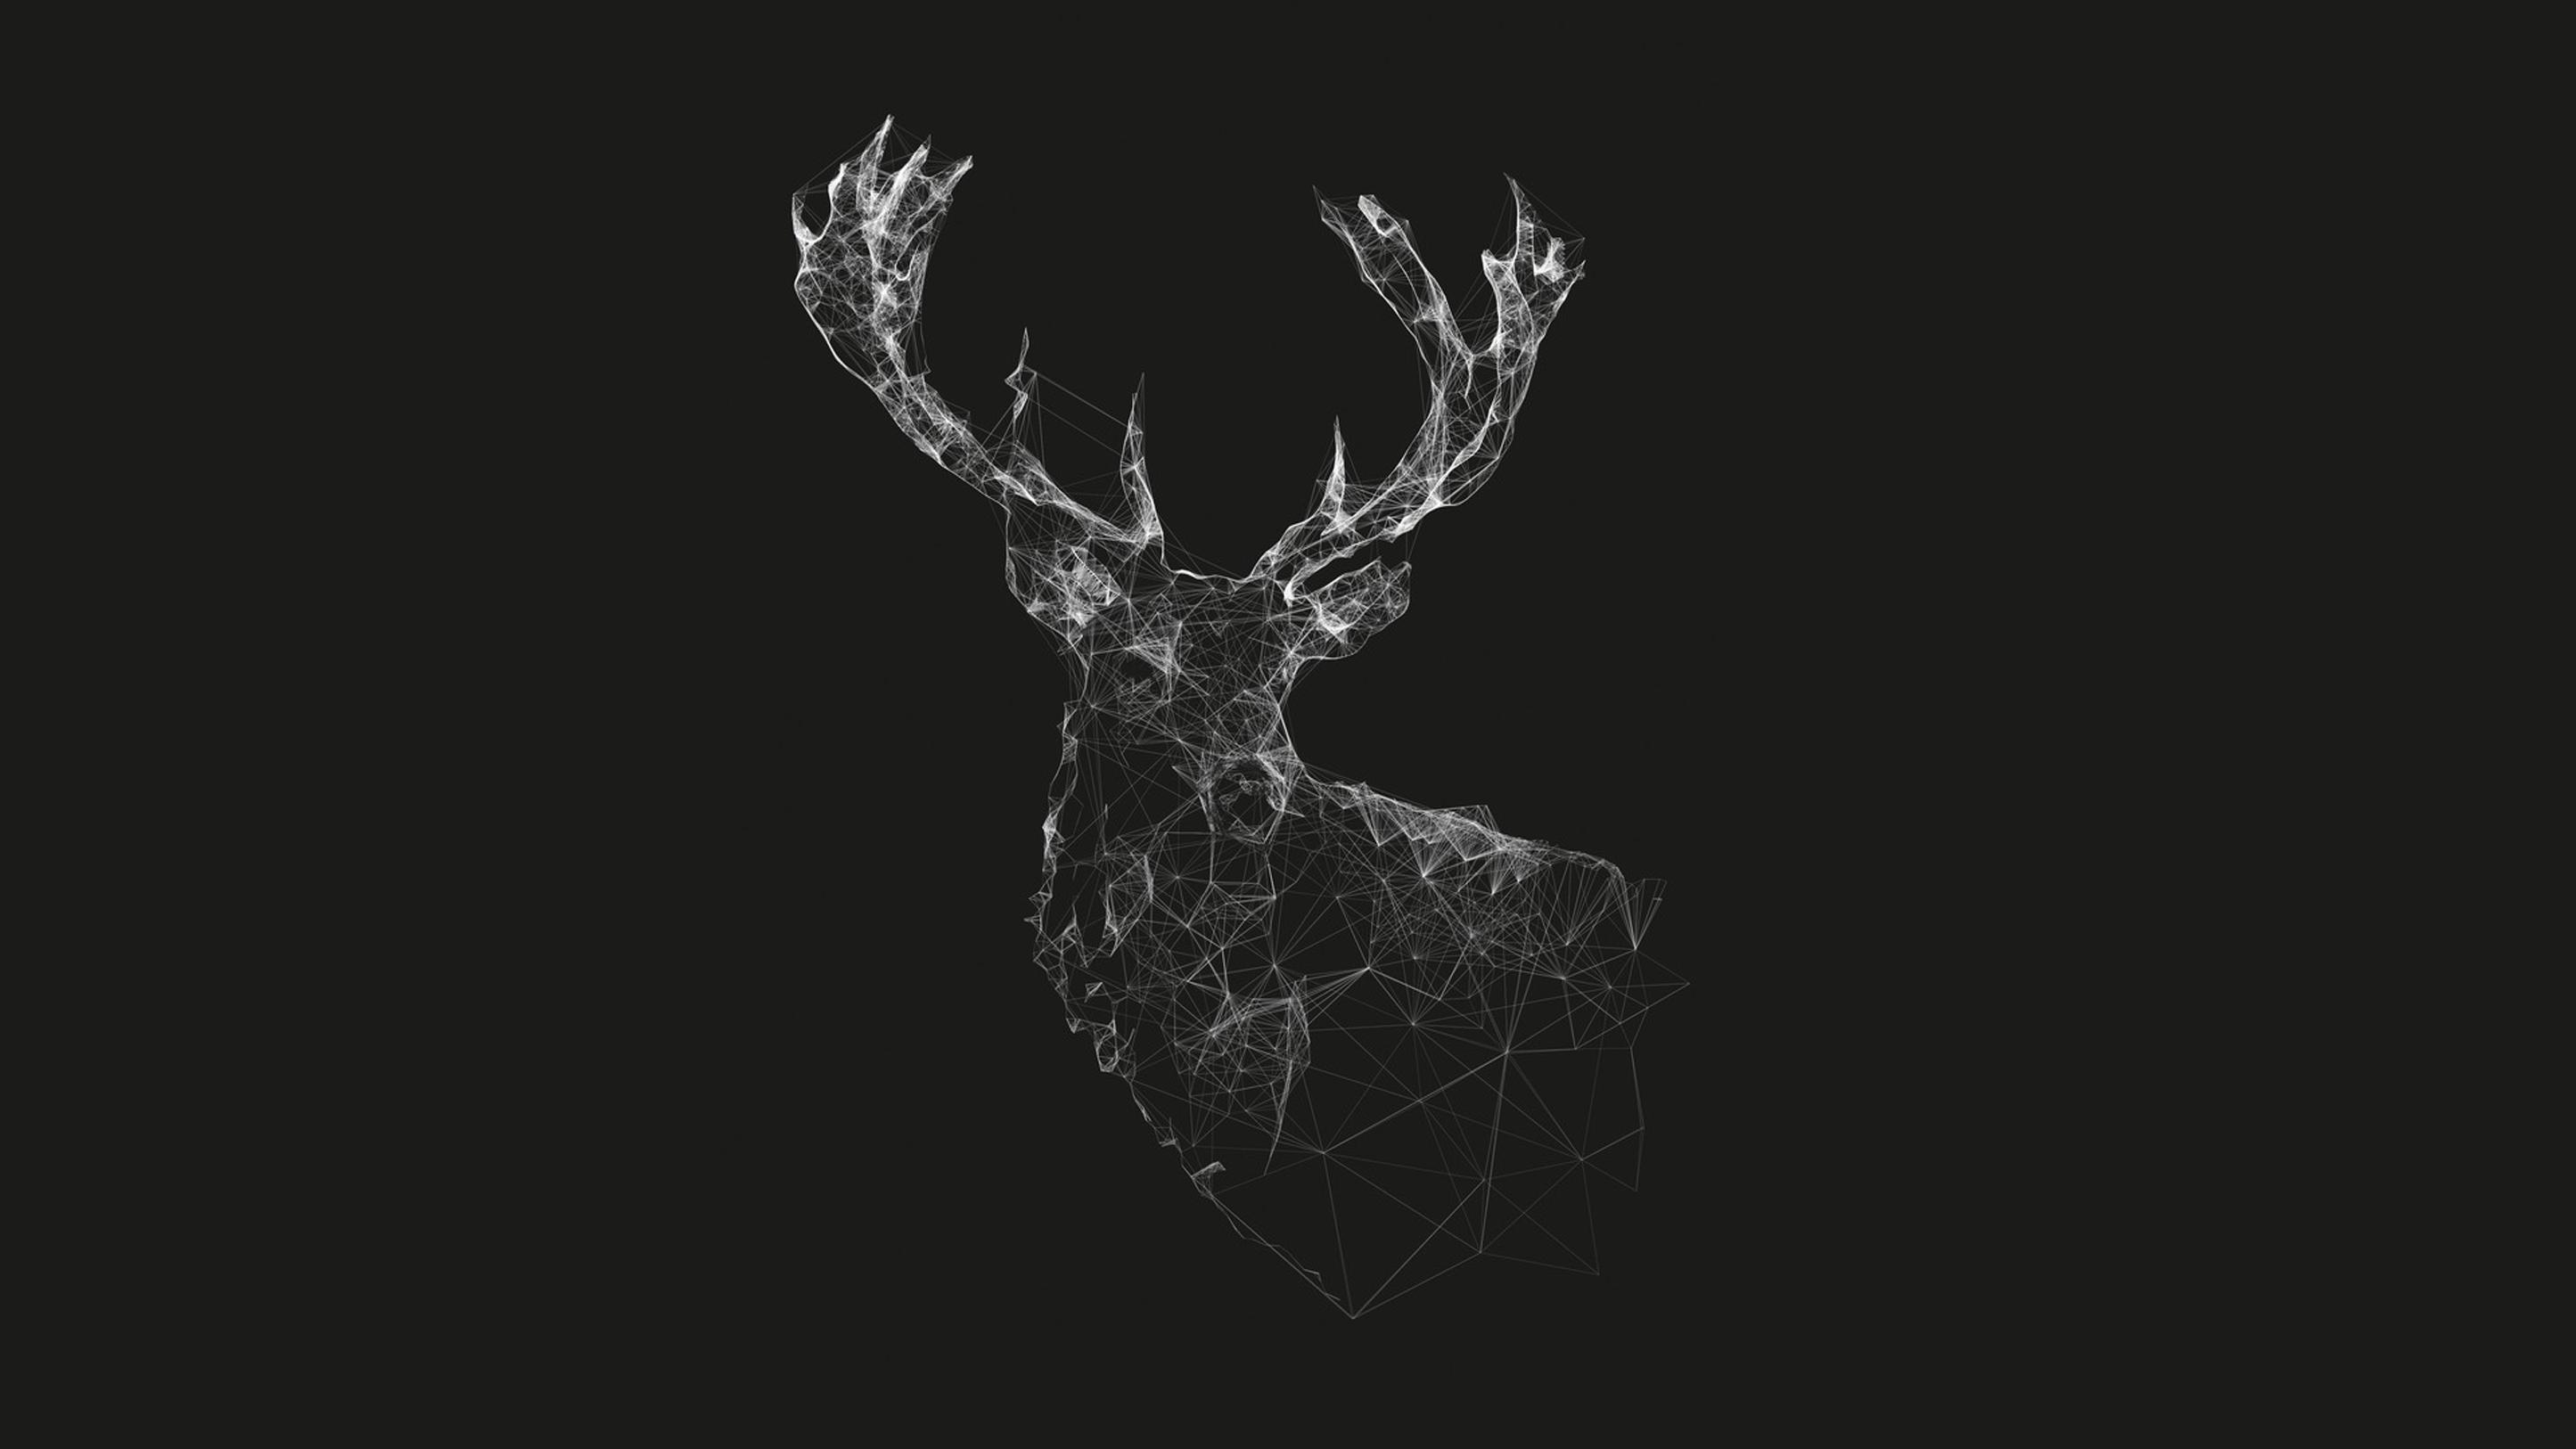 WireFrame-Deer-Graphic-HD-Wallpaper | photoshop inspiration | Pinterest